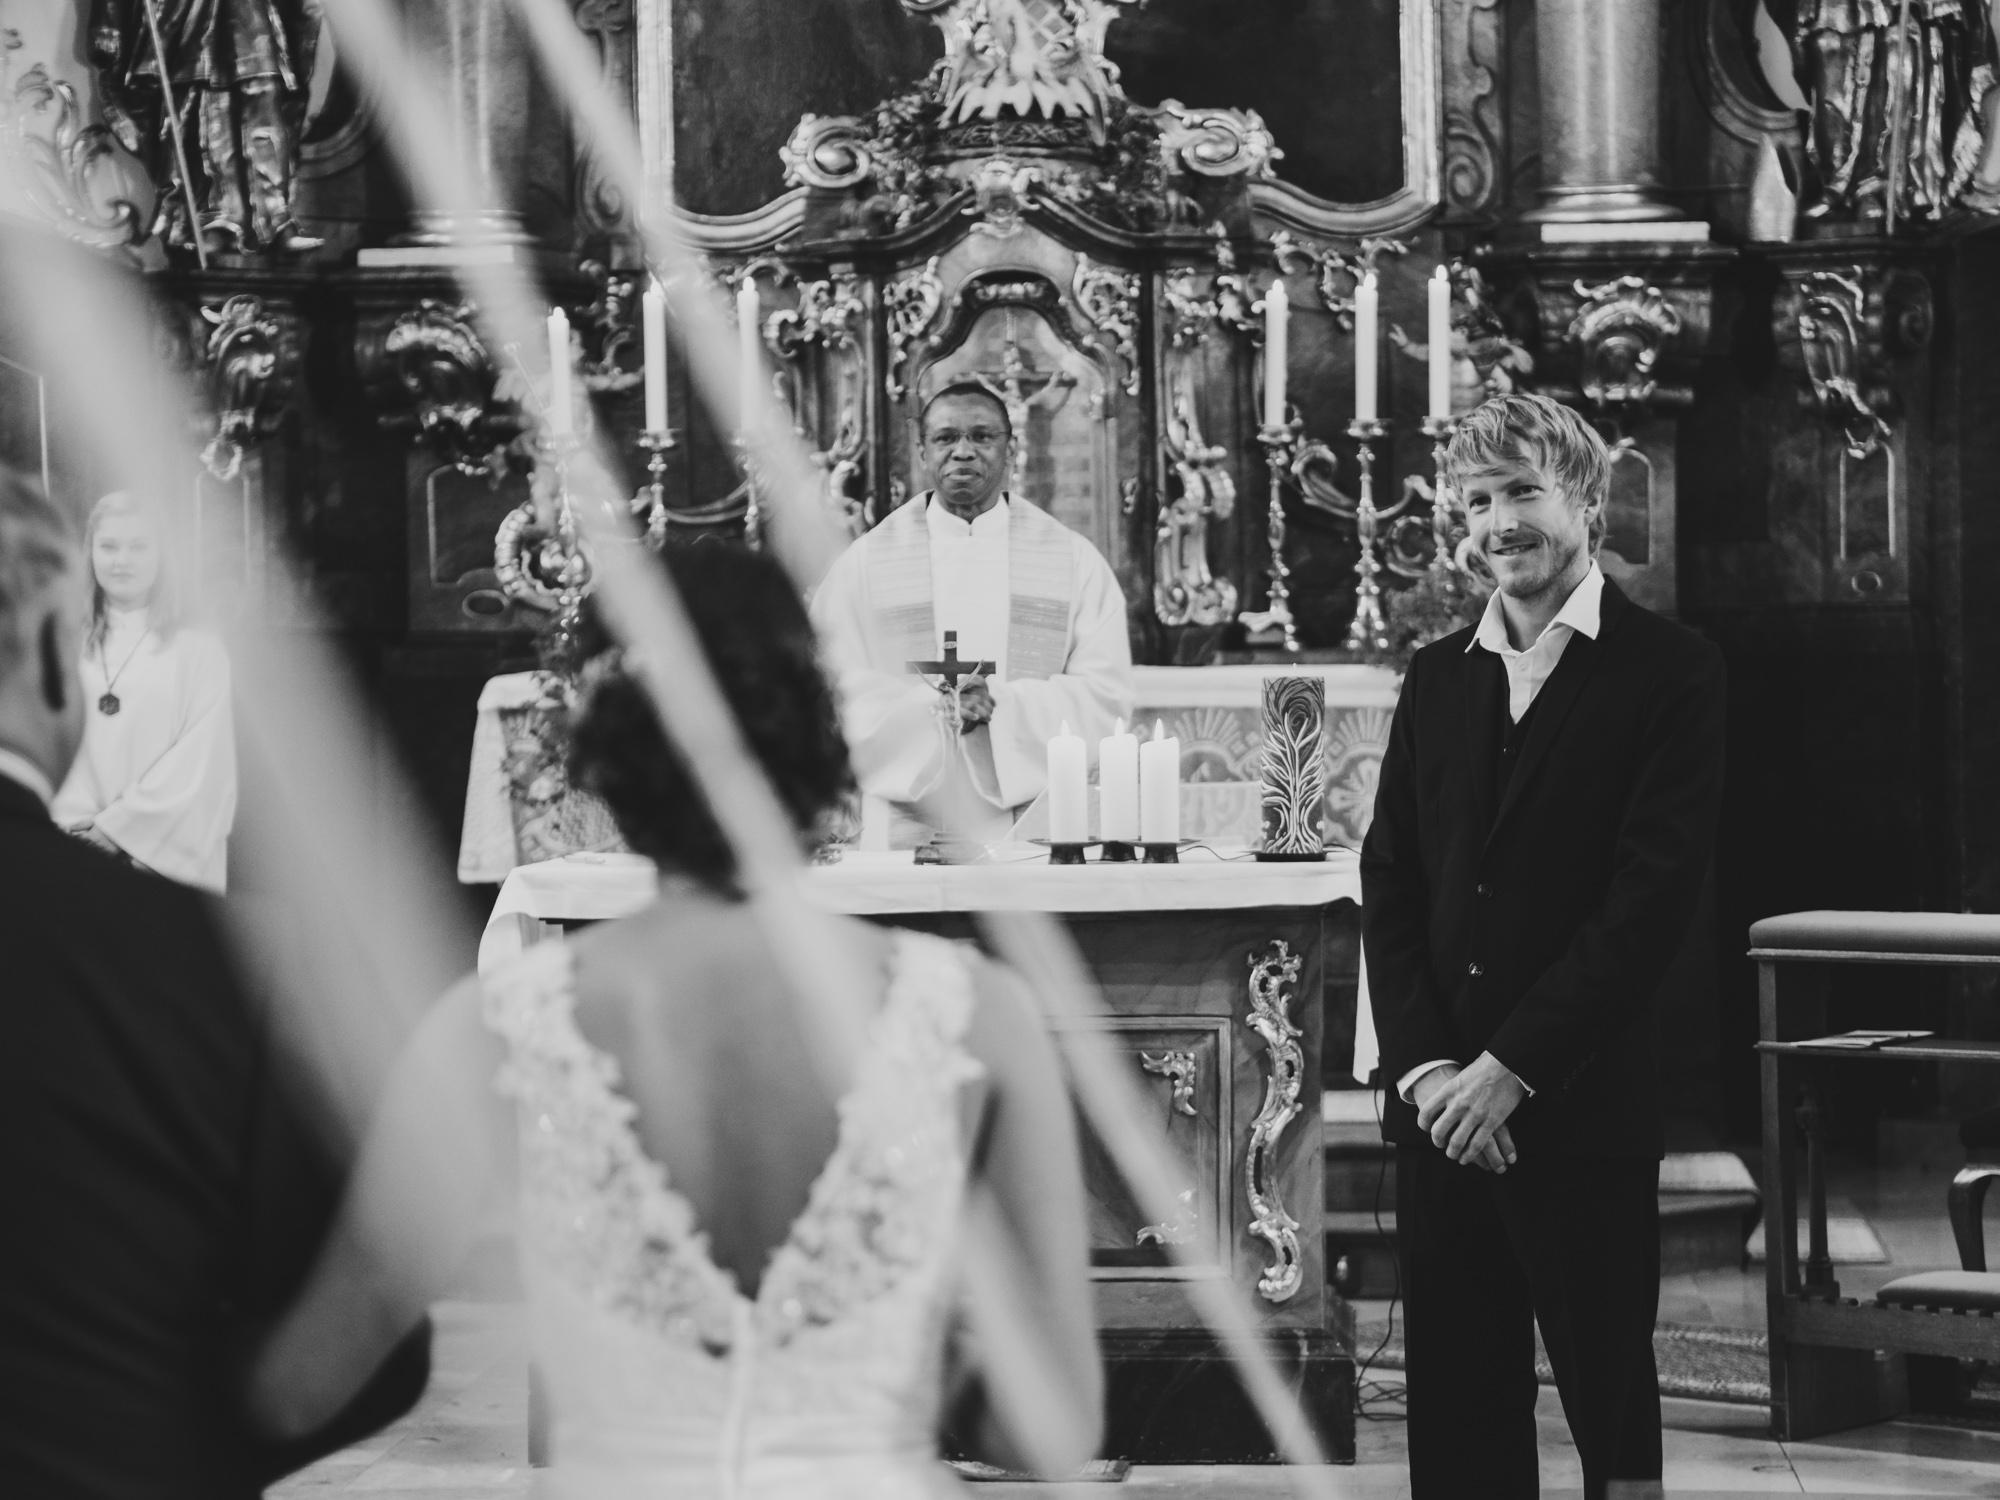 Hochzeit-Memory-factory-20170909-0002.jpg